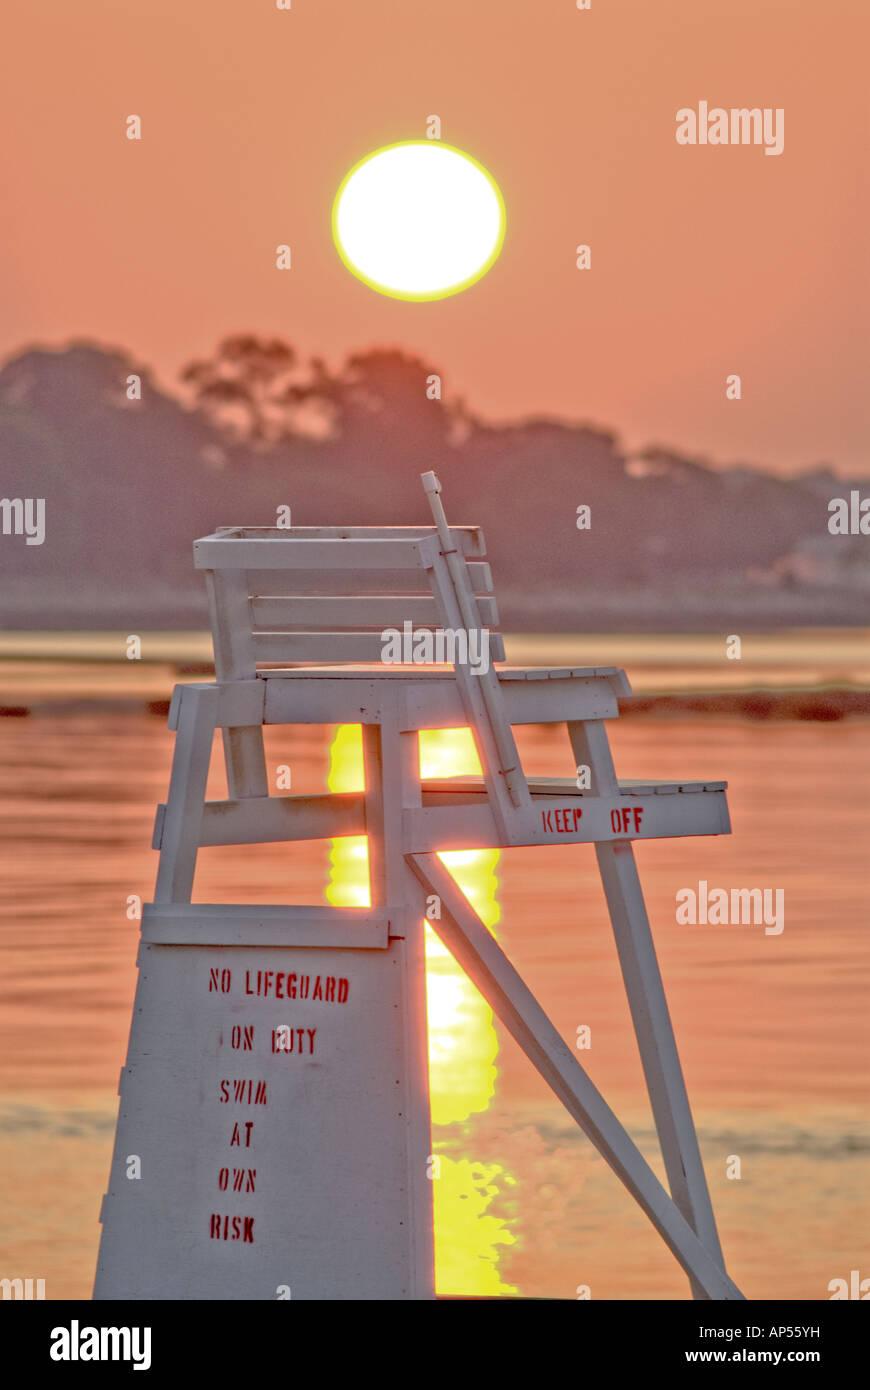 Sun Rising Over Lifeguard Chair, Compo Beach, Westport, Ct. USA.